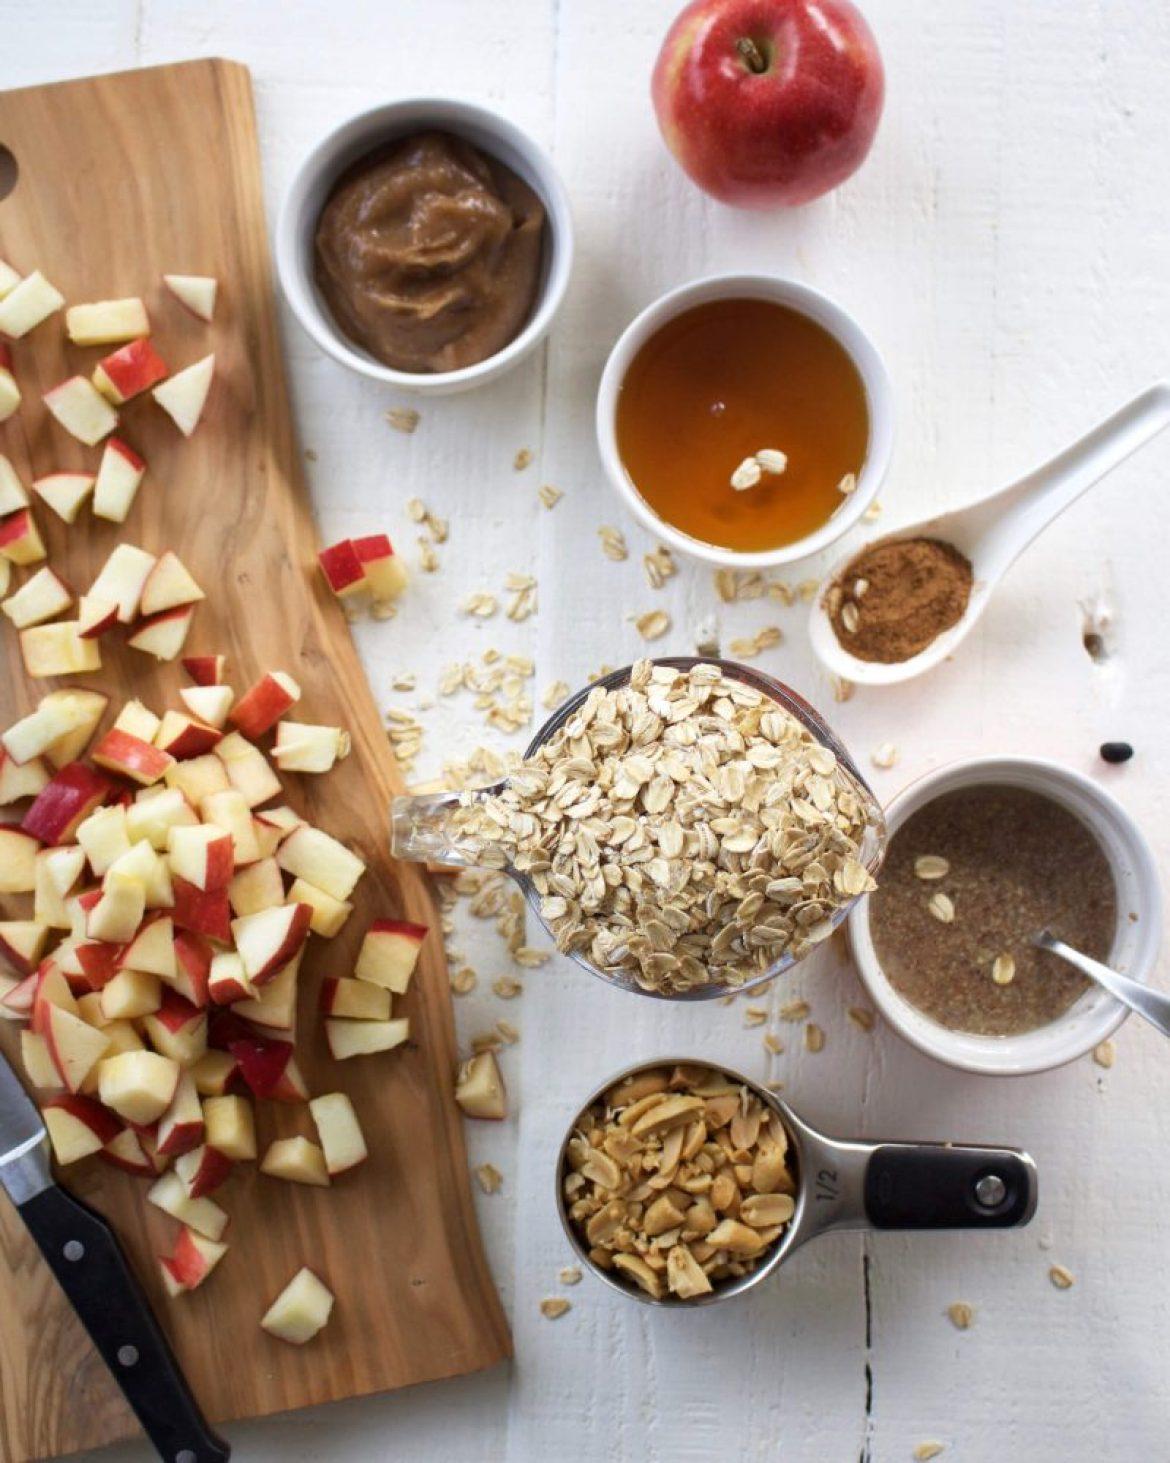 Apple Baked Oatmeal with Vegan Caramel Sauce